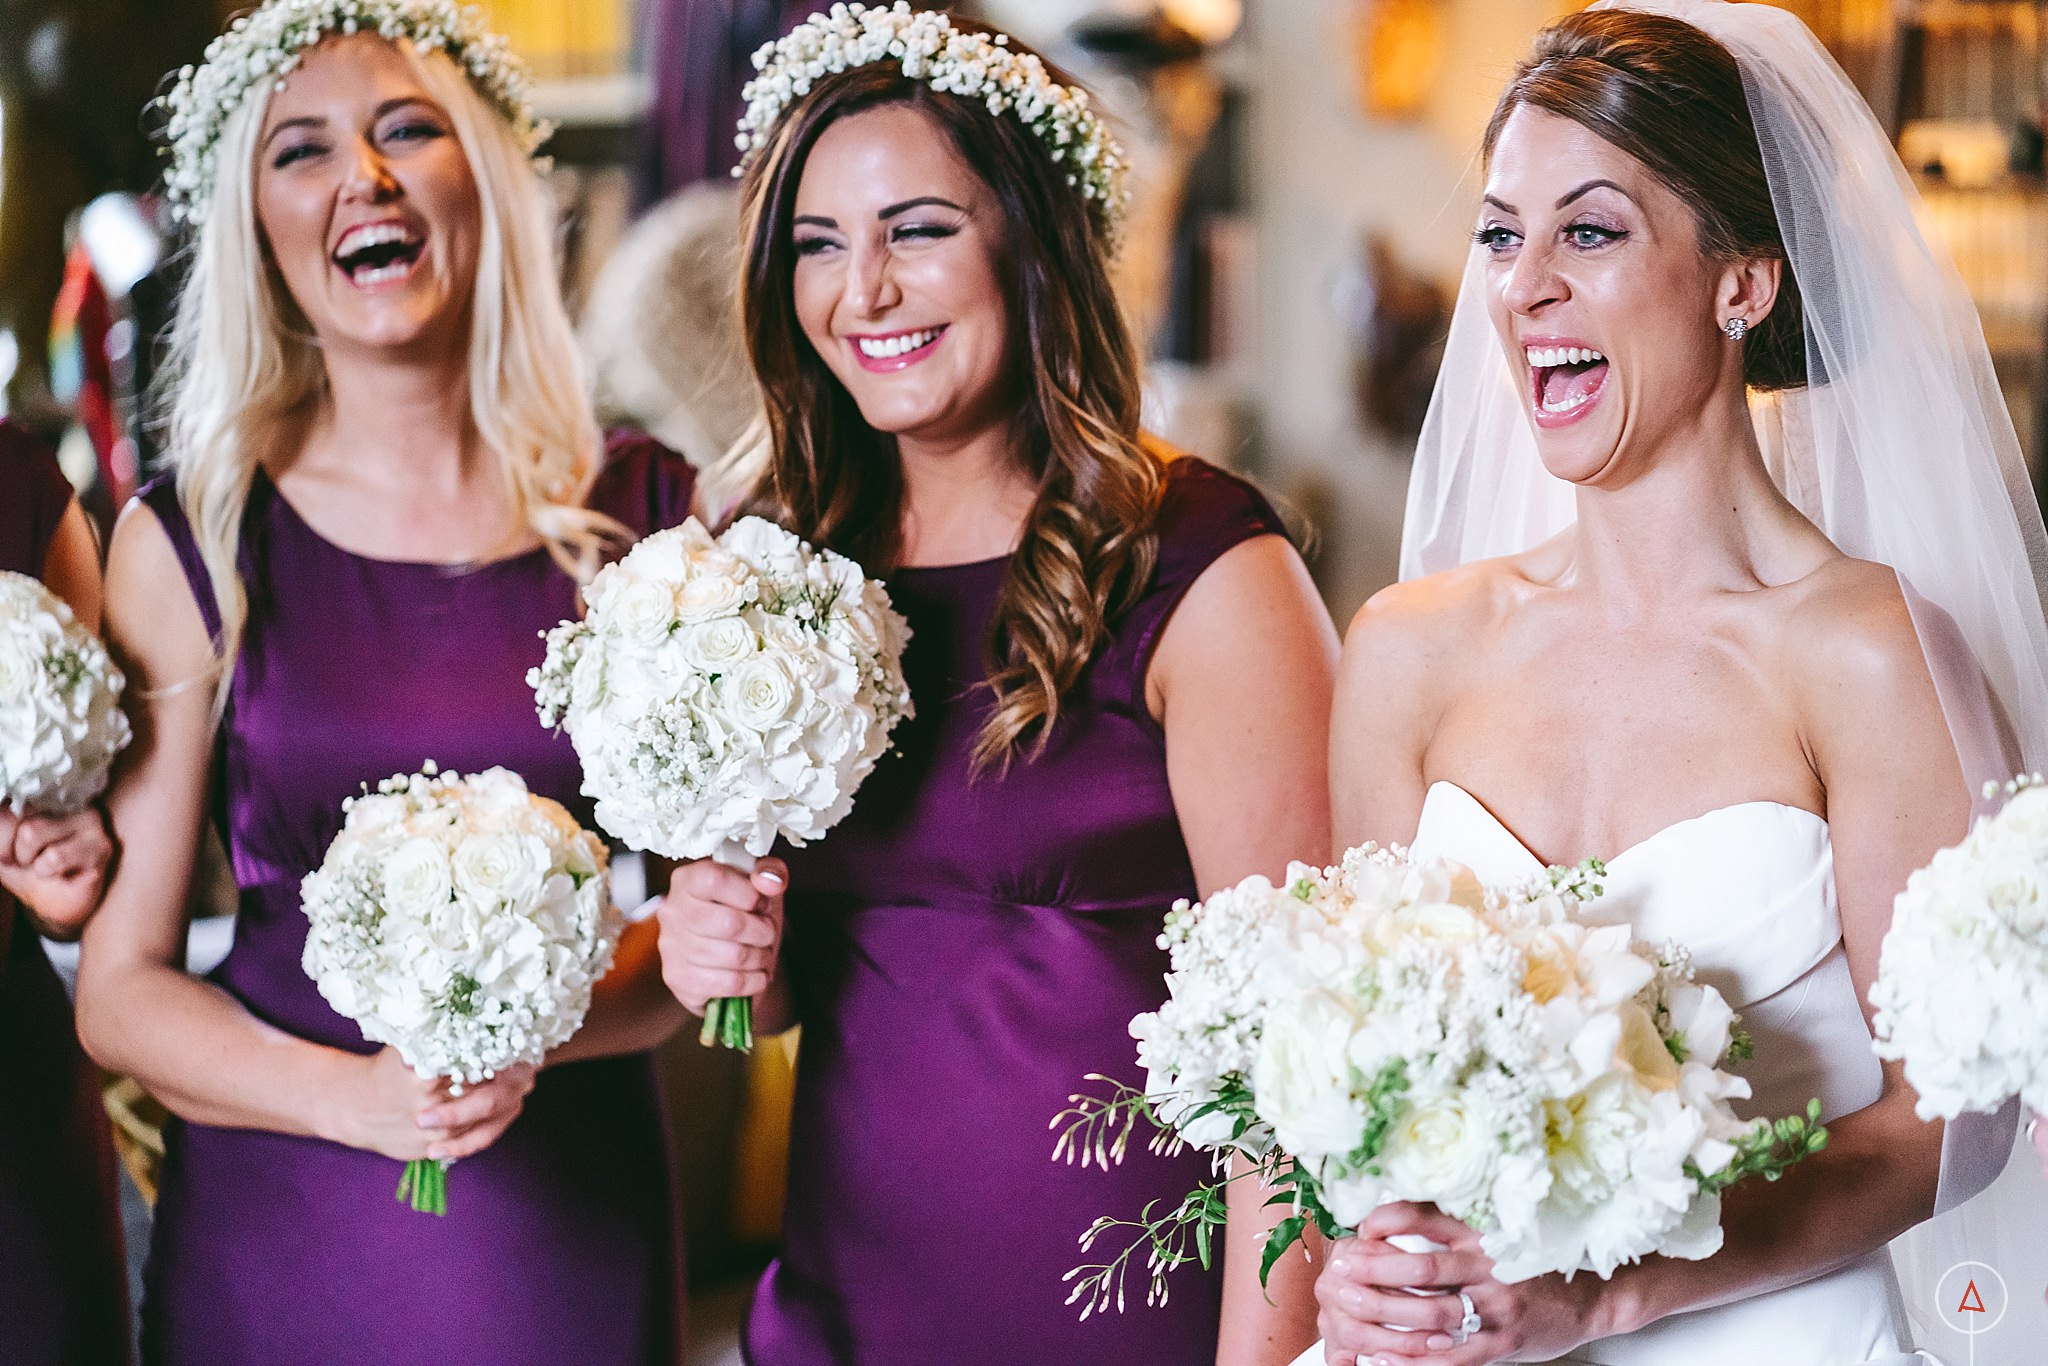 cardiff-wedding-photographer-aga-tomaszek_0270